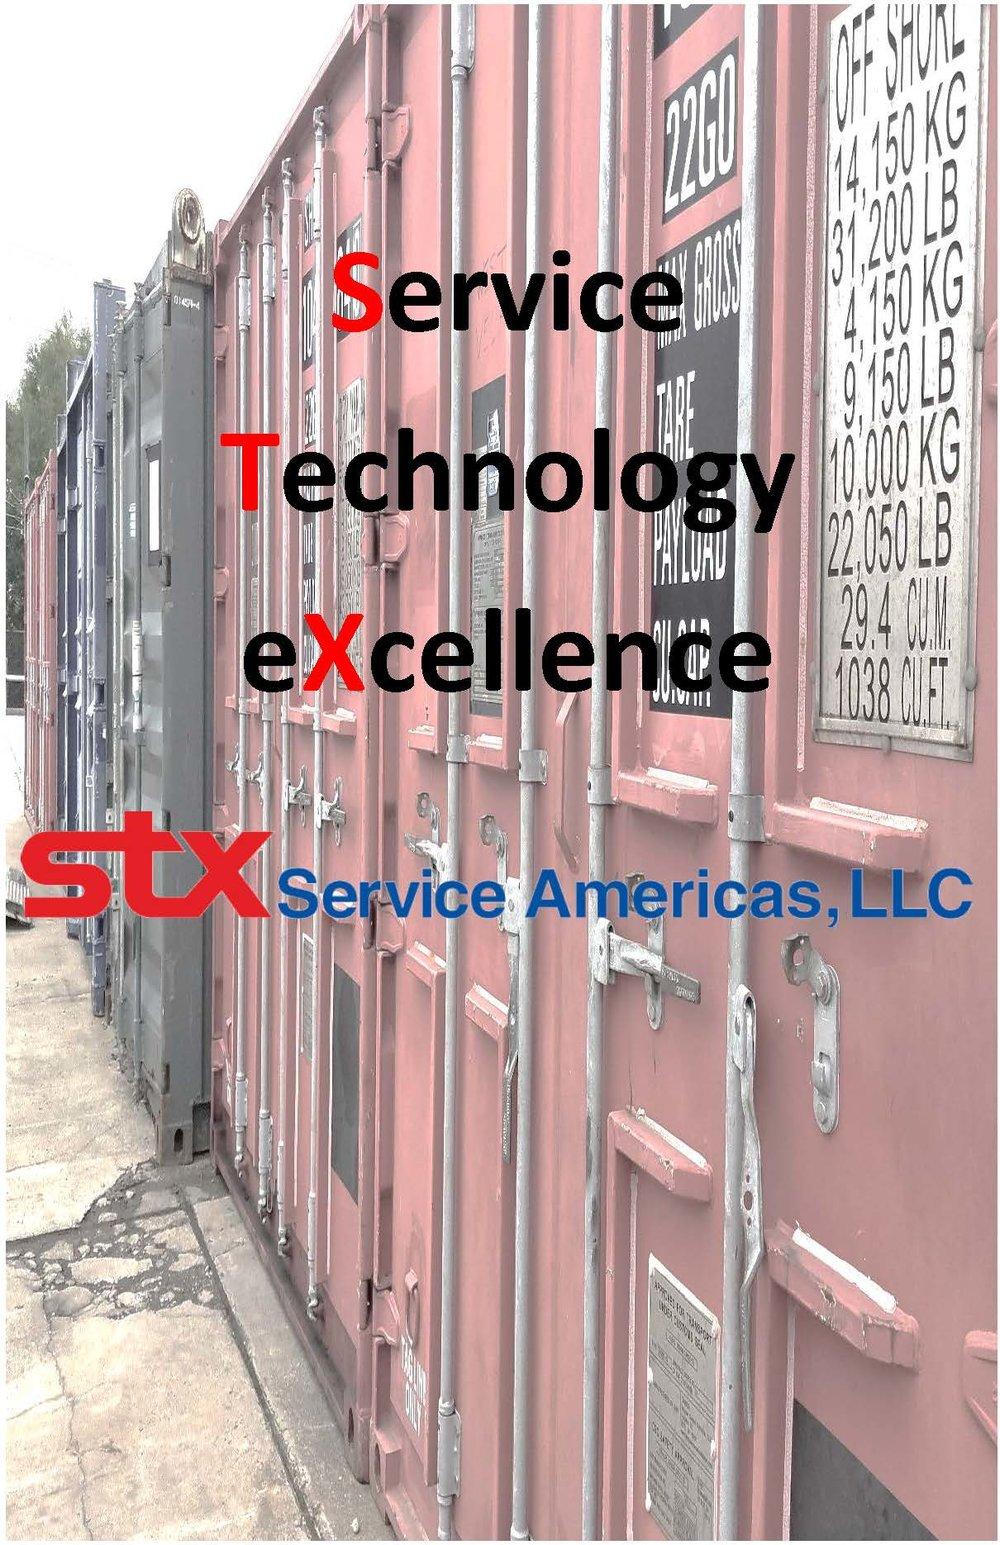 STXSA Brochure 2018_Page_08.jpg